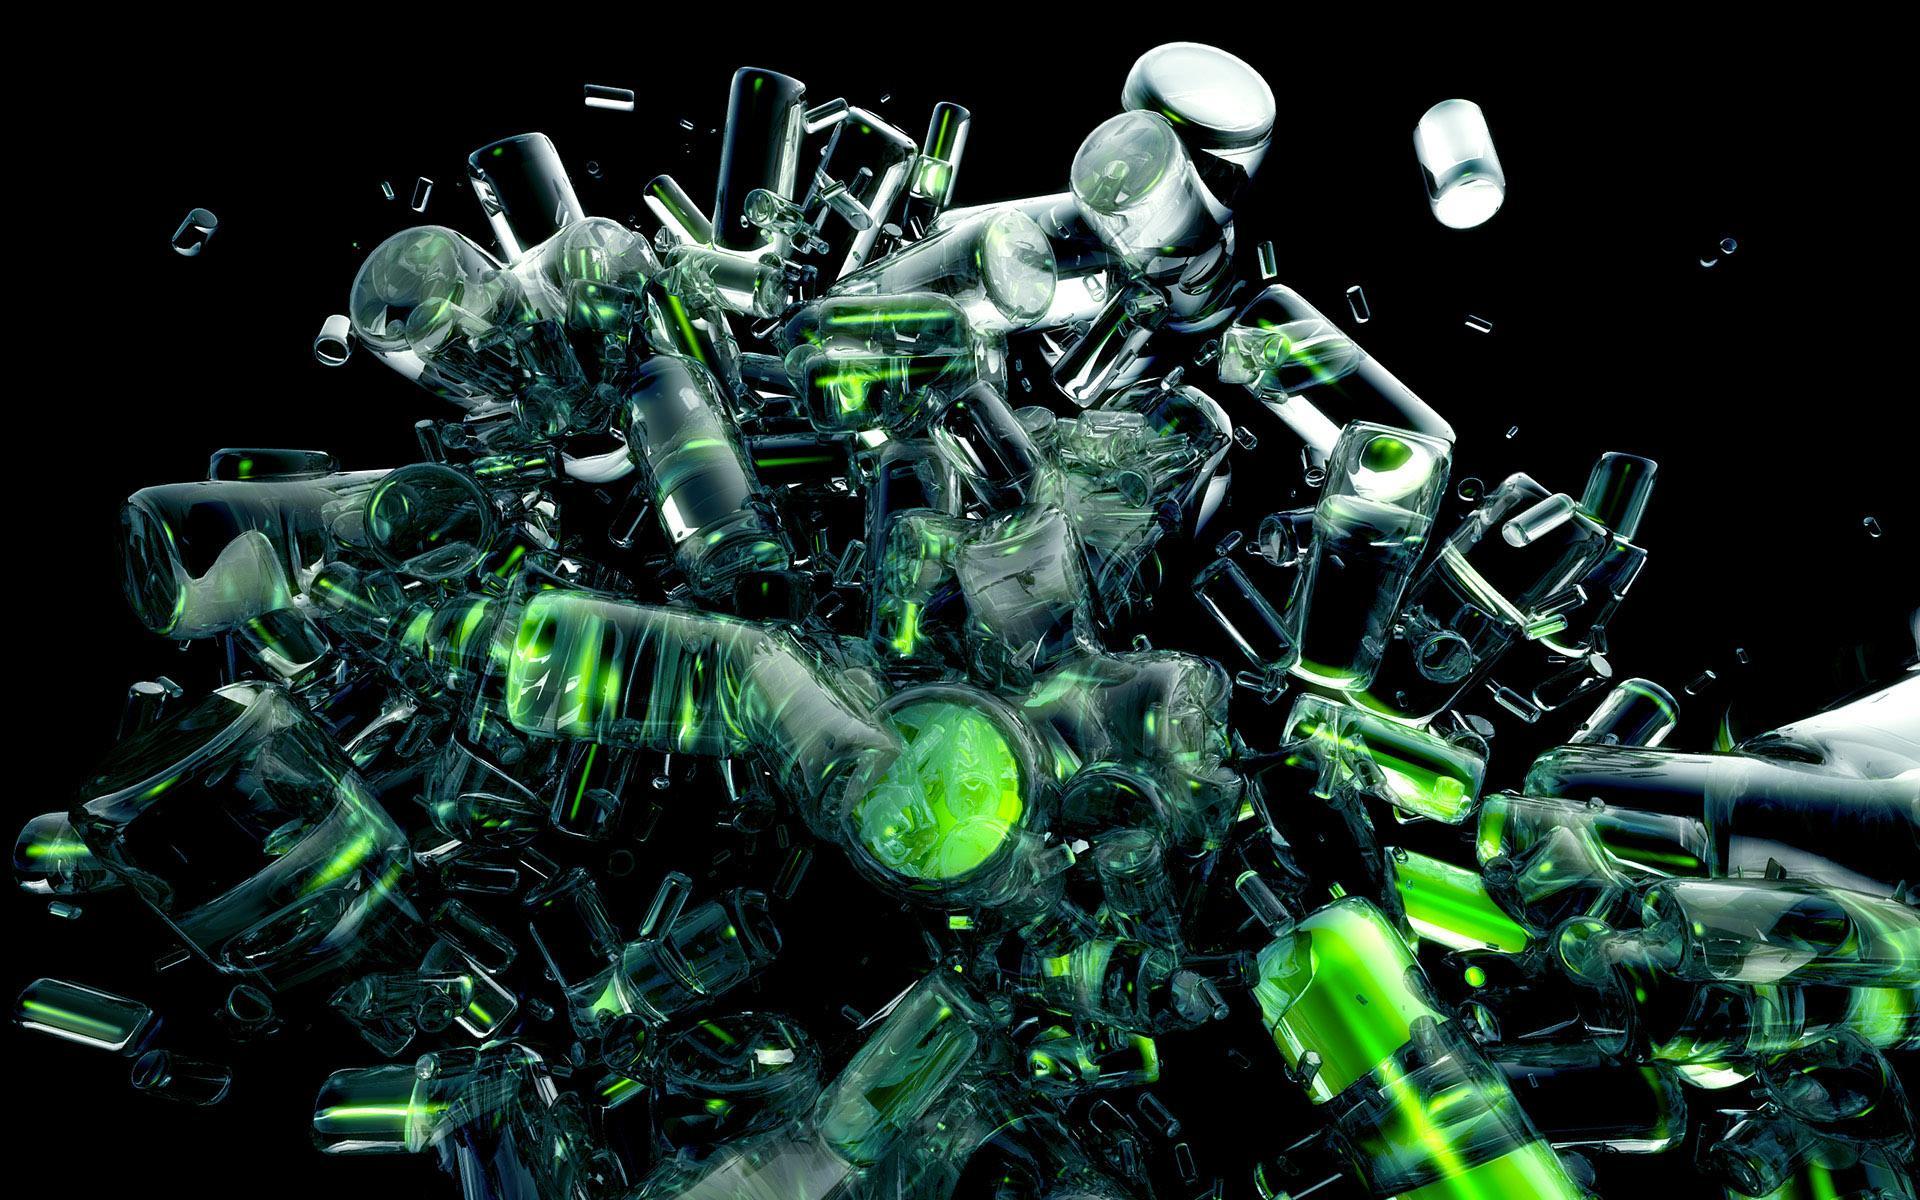 Abstract Wallpaper Green HD